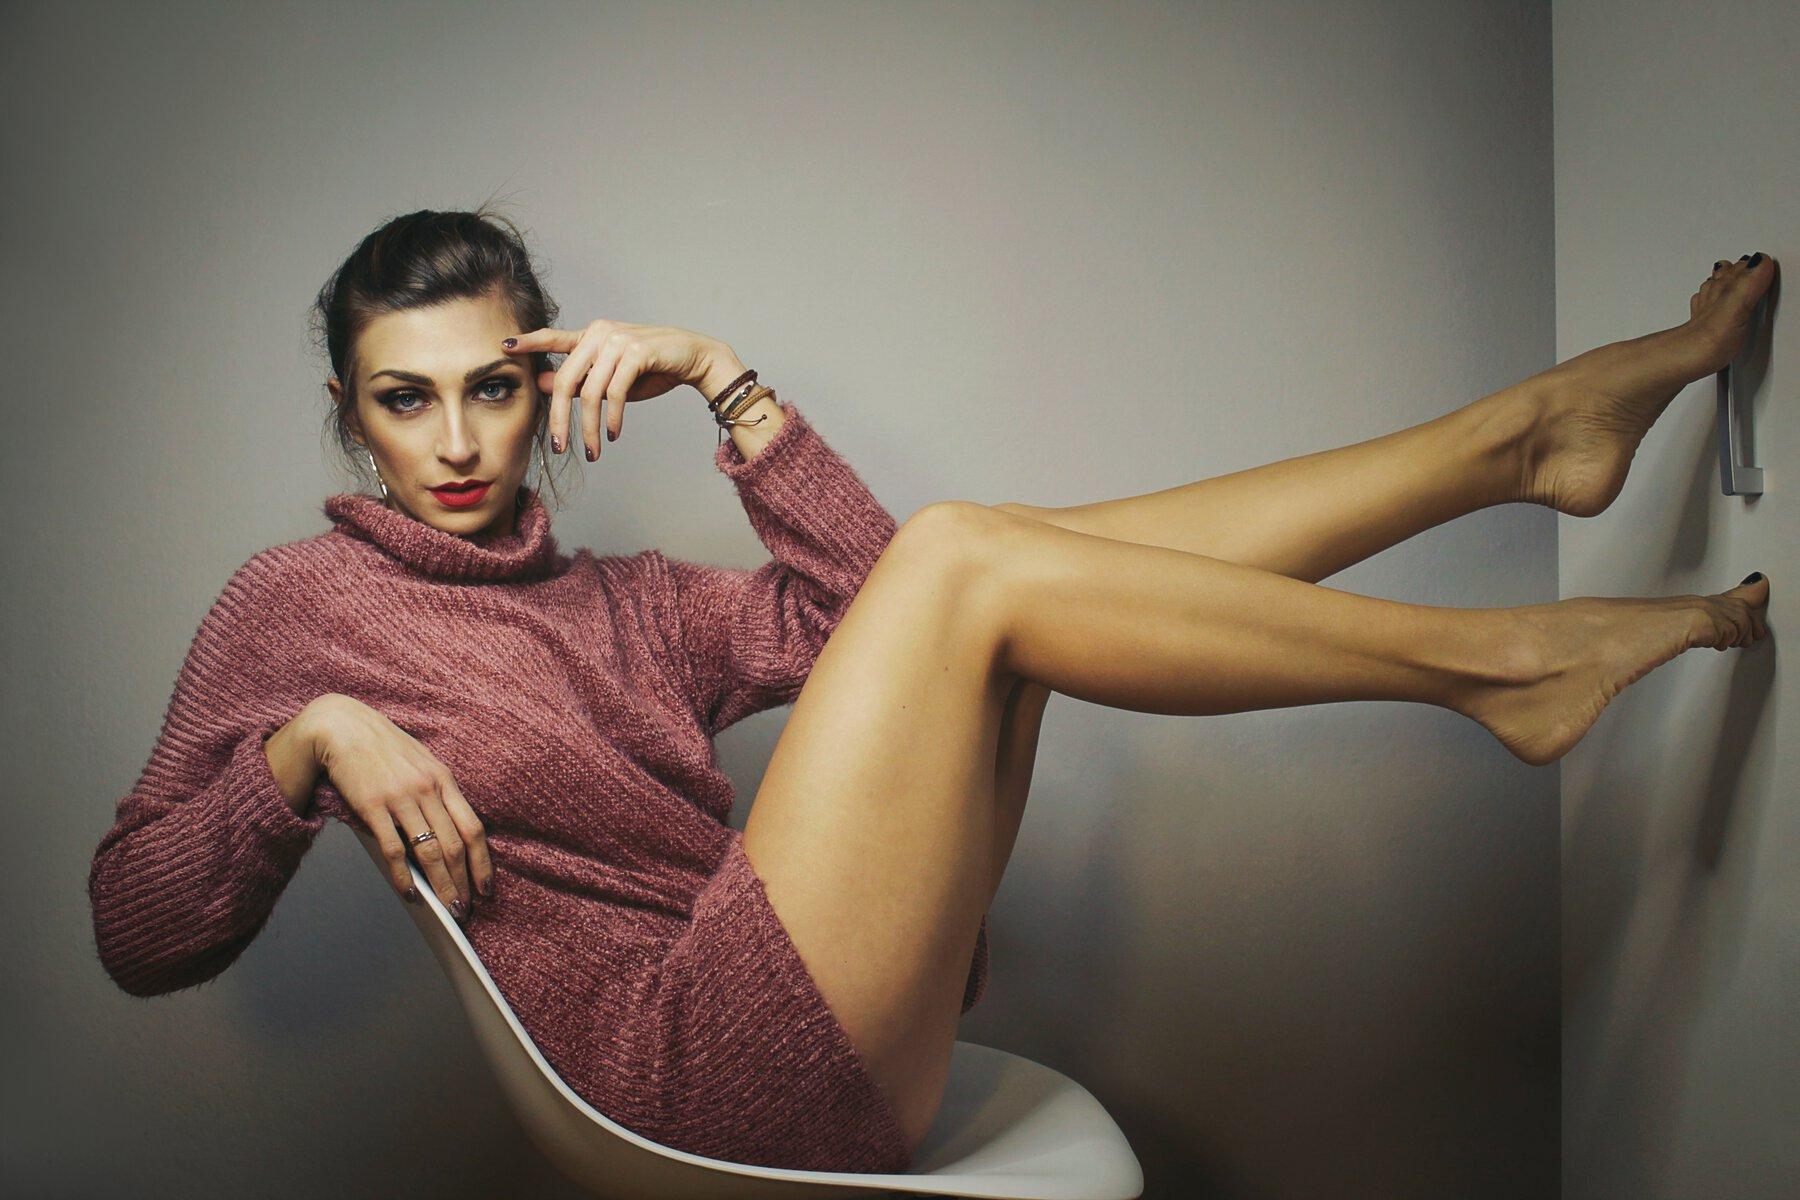 girl from Uberhorny app wearing a sweater showing off her legs